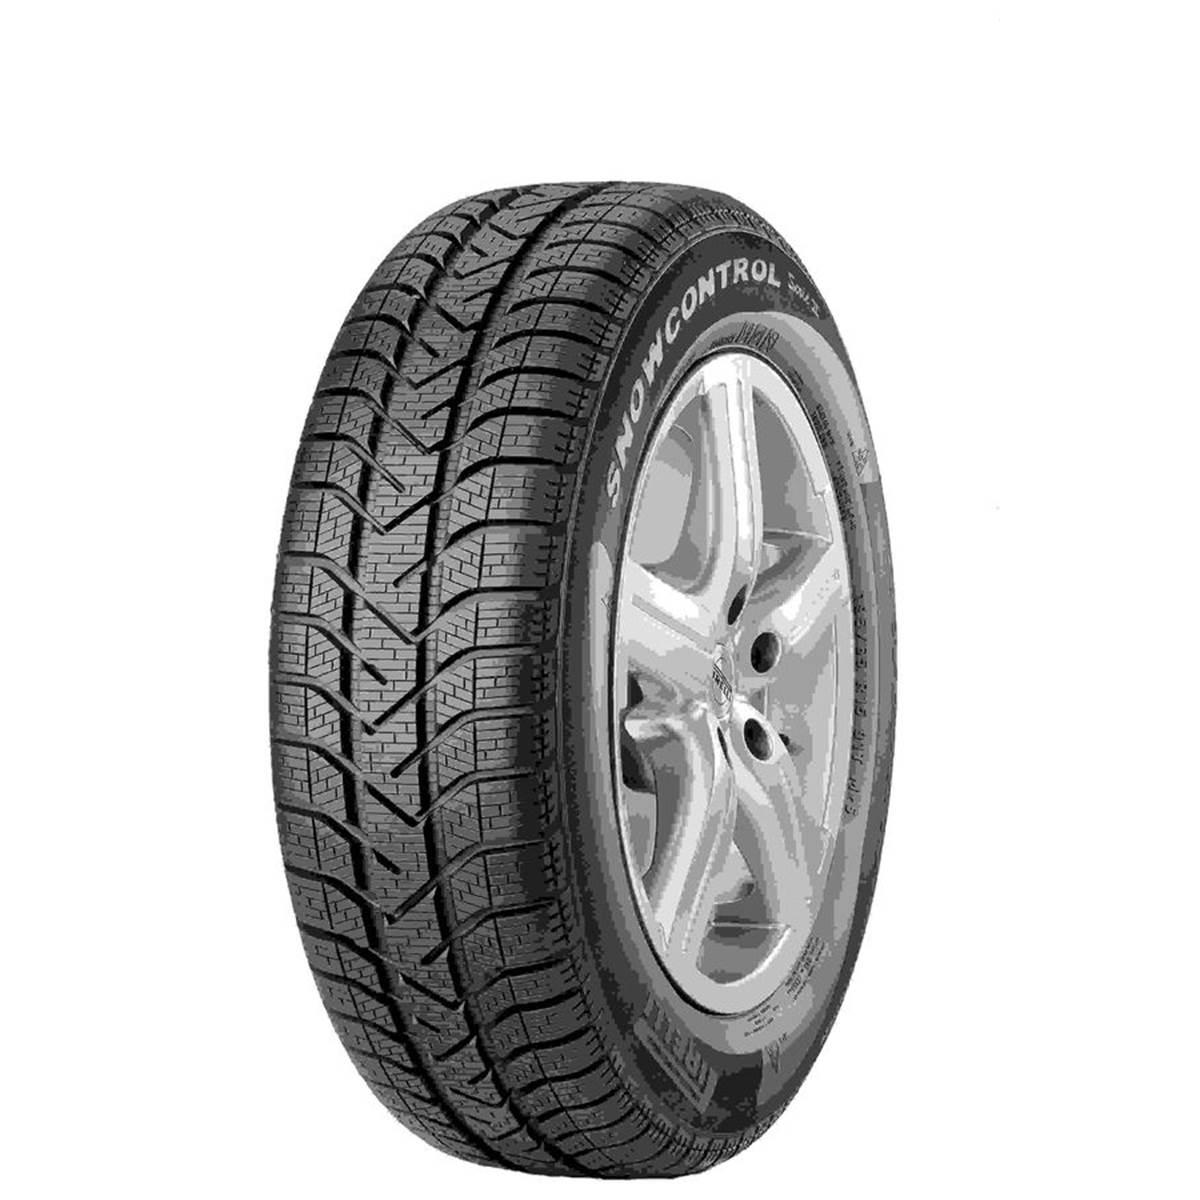 pneu pirelli winter 240 snowsport xl moins cher sur pneu pas cher. Black Bedroom Furniture Sets. Home Design Ideas